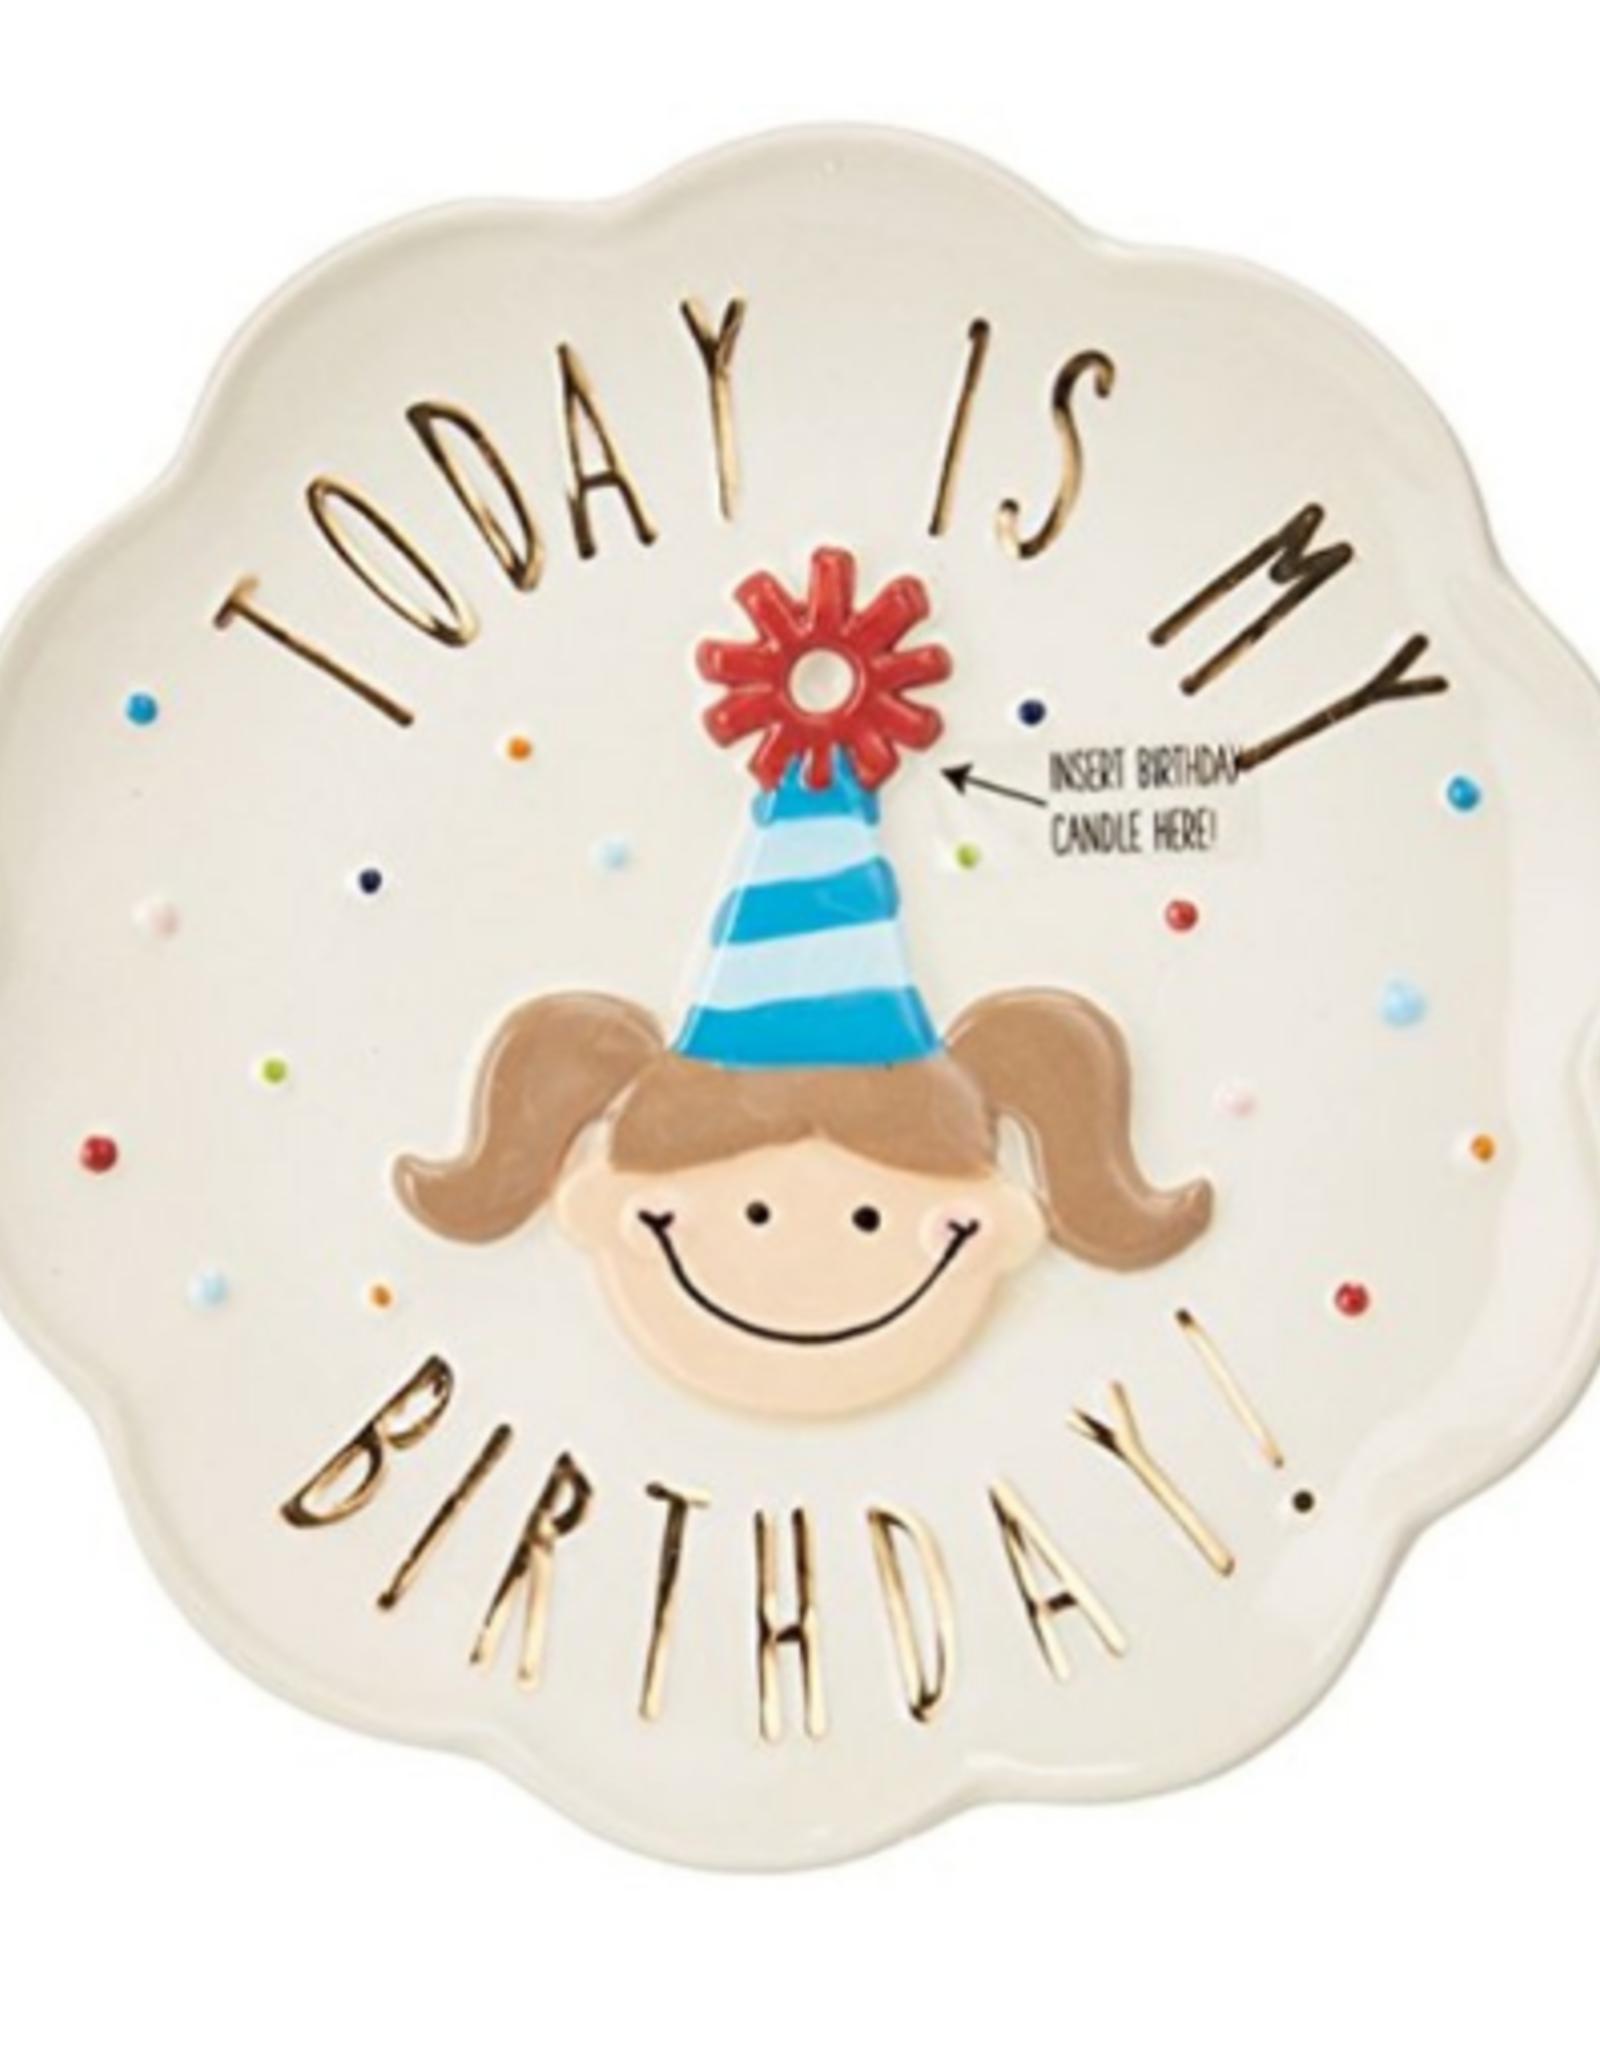 Birthday Girl Plate